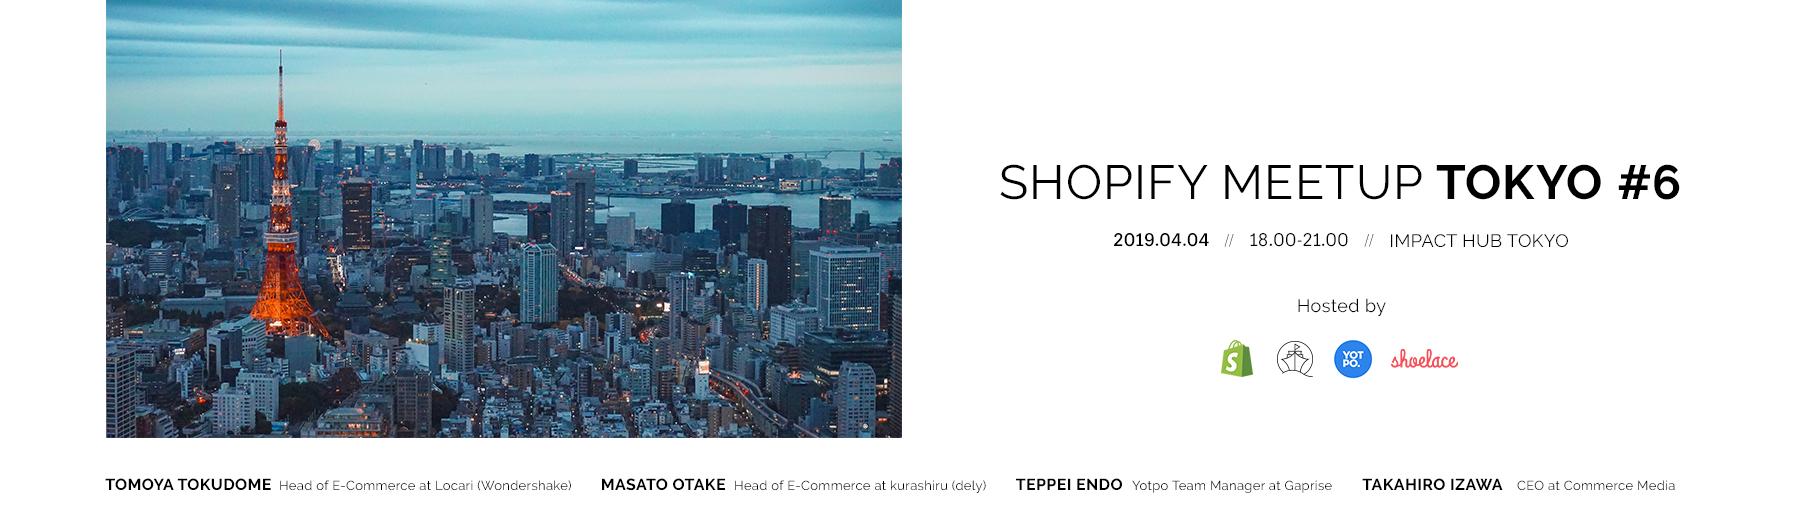 Shopify Meetup Tokyo #6